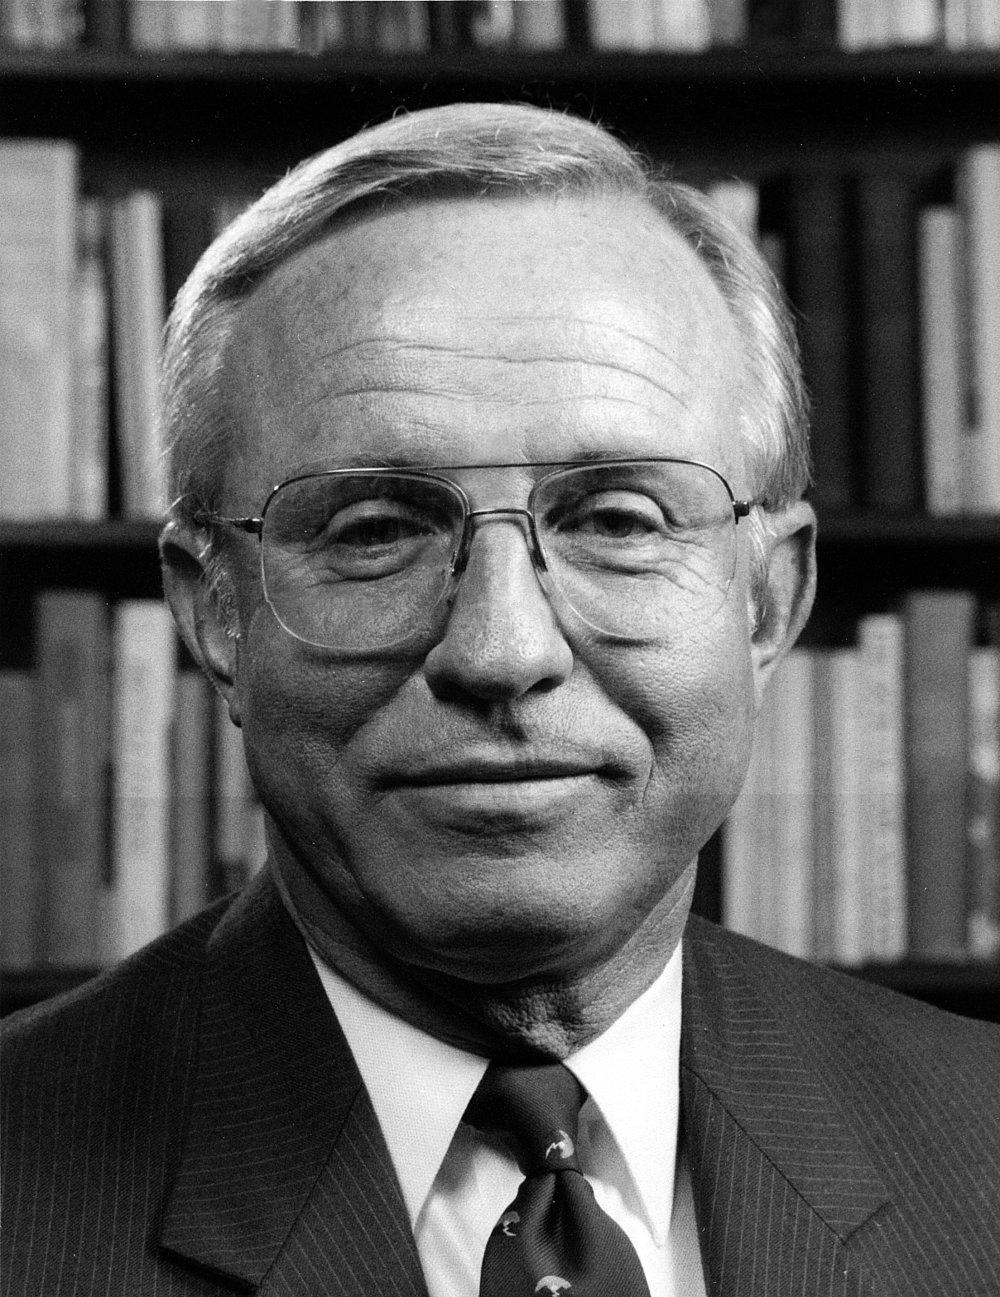 Haskell Monroe Jr.